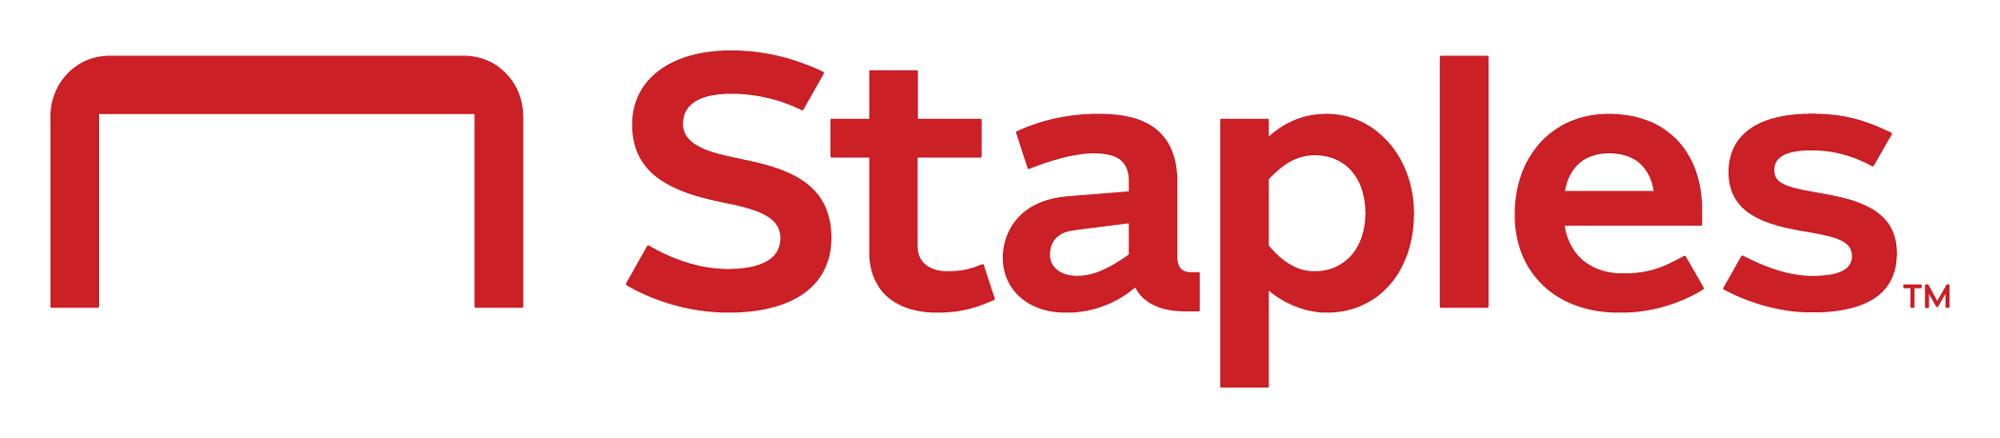 brand new new logo